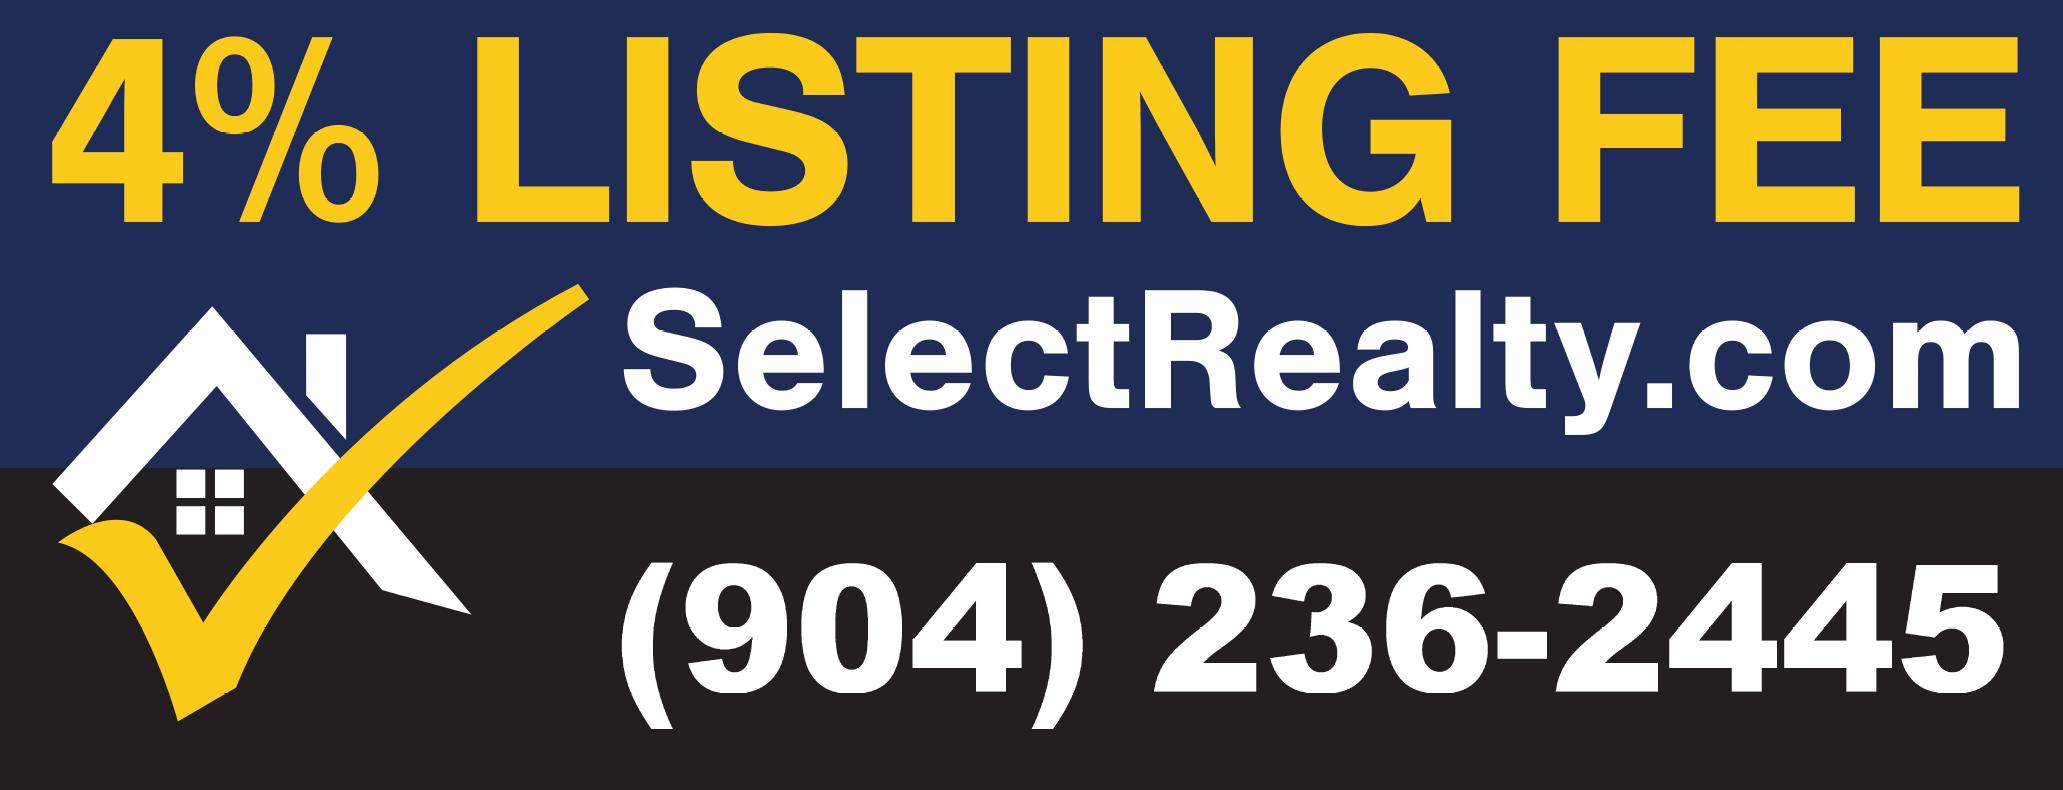 Select Realty Llc